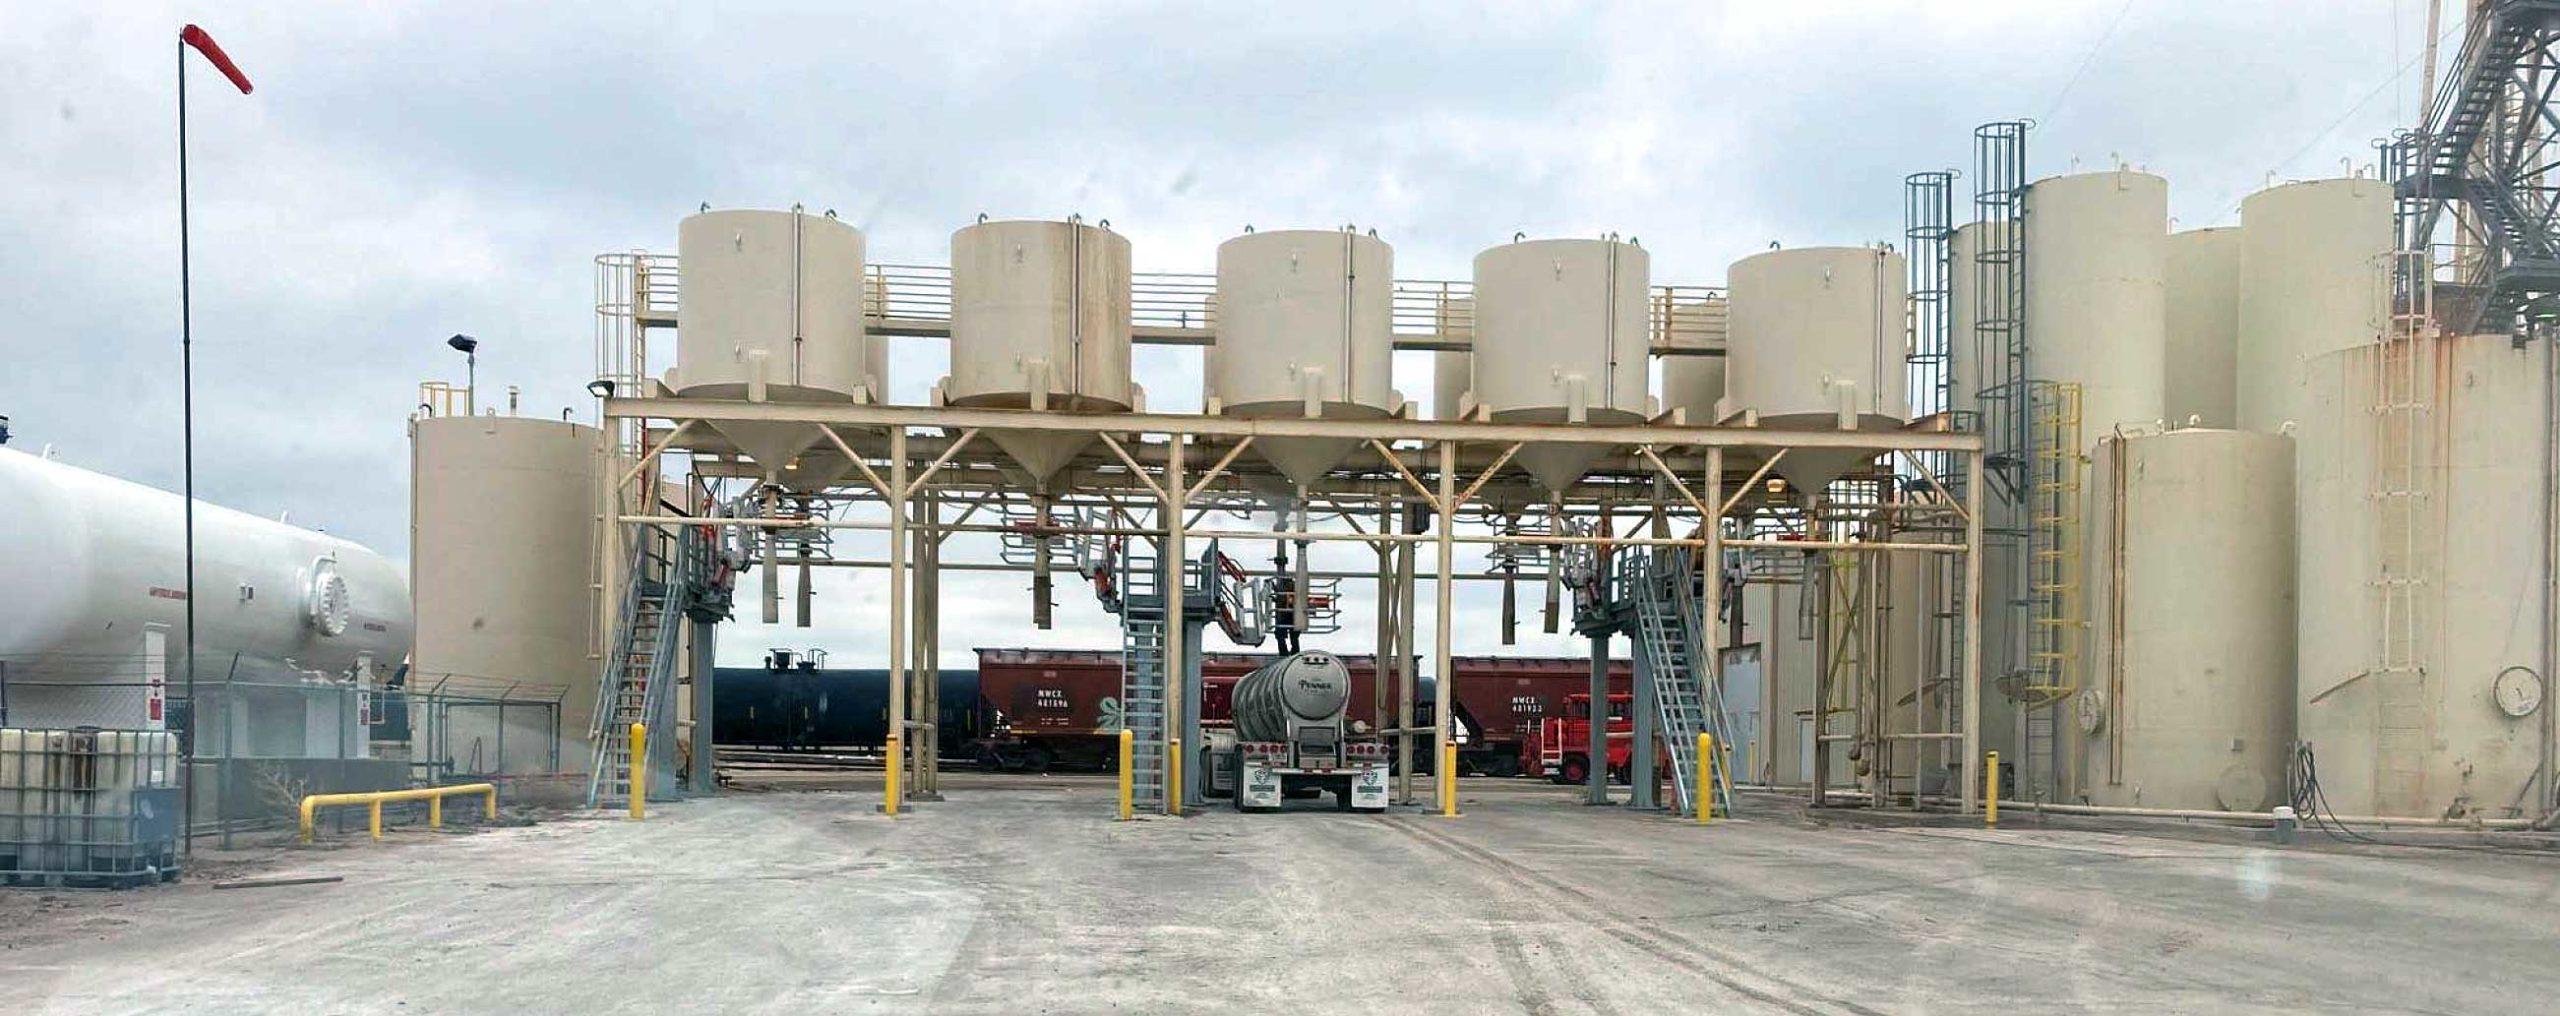 Feed silos - 5-Spot bulk loading station